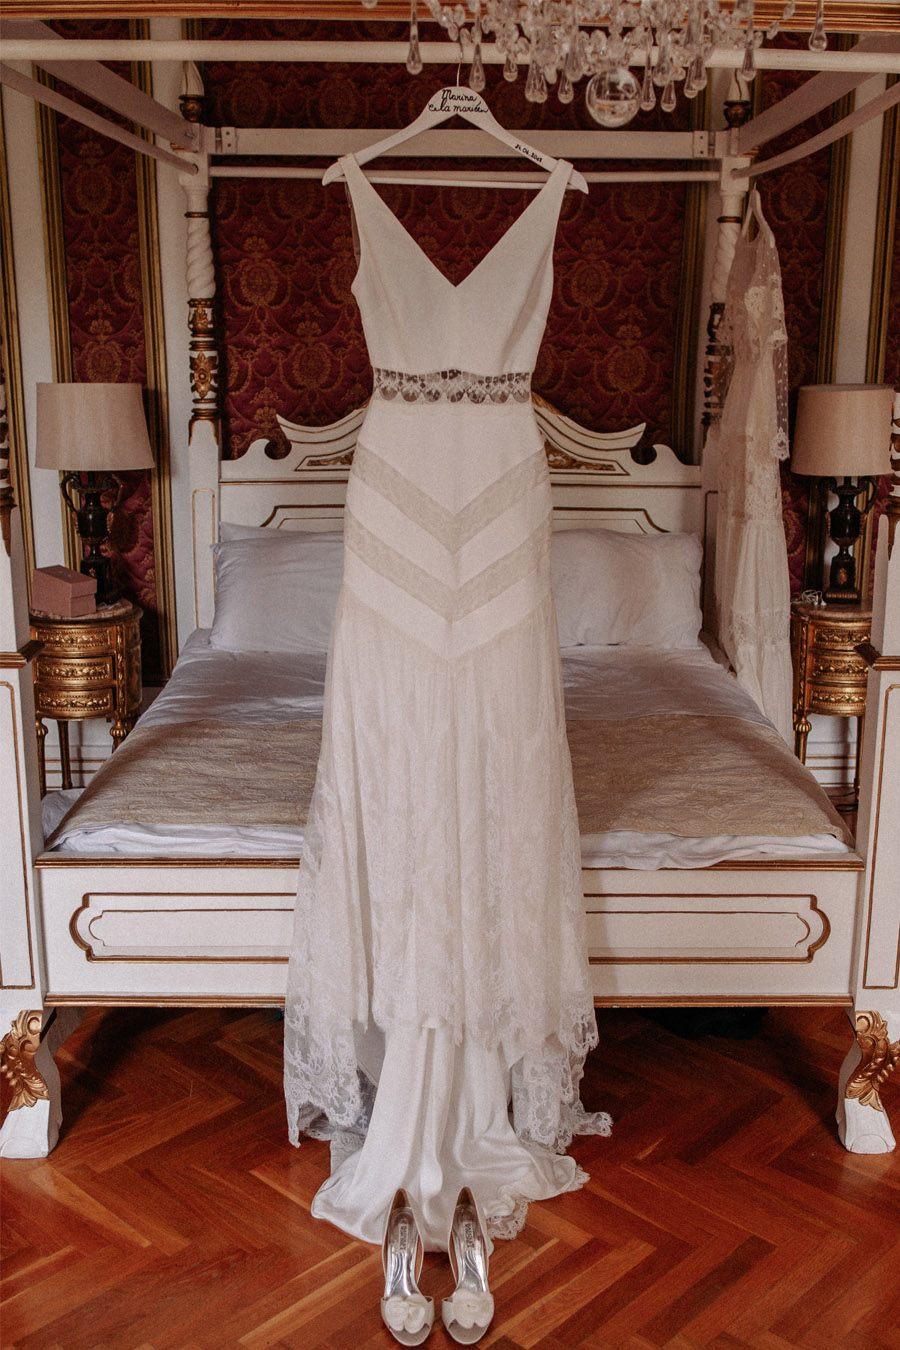 MARINA & PIERRE: INCREÍBLE FIN DE SEMANA DE BODA (II) vestido-novia-2